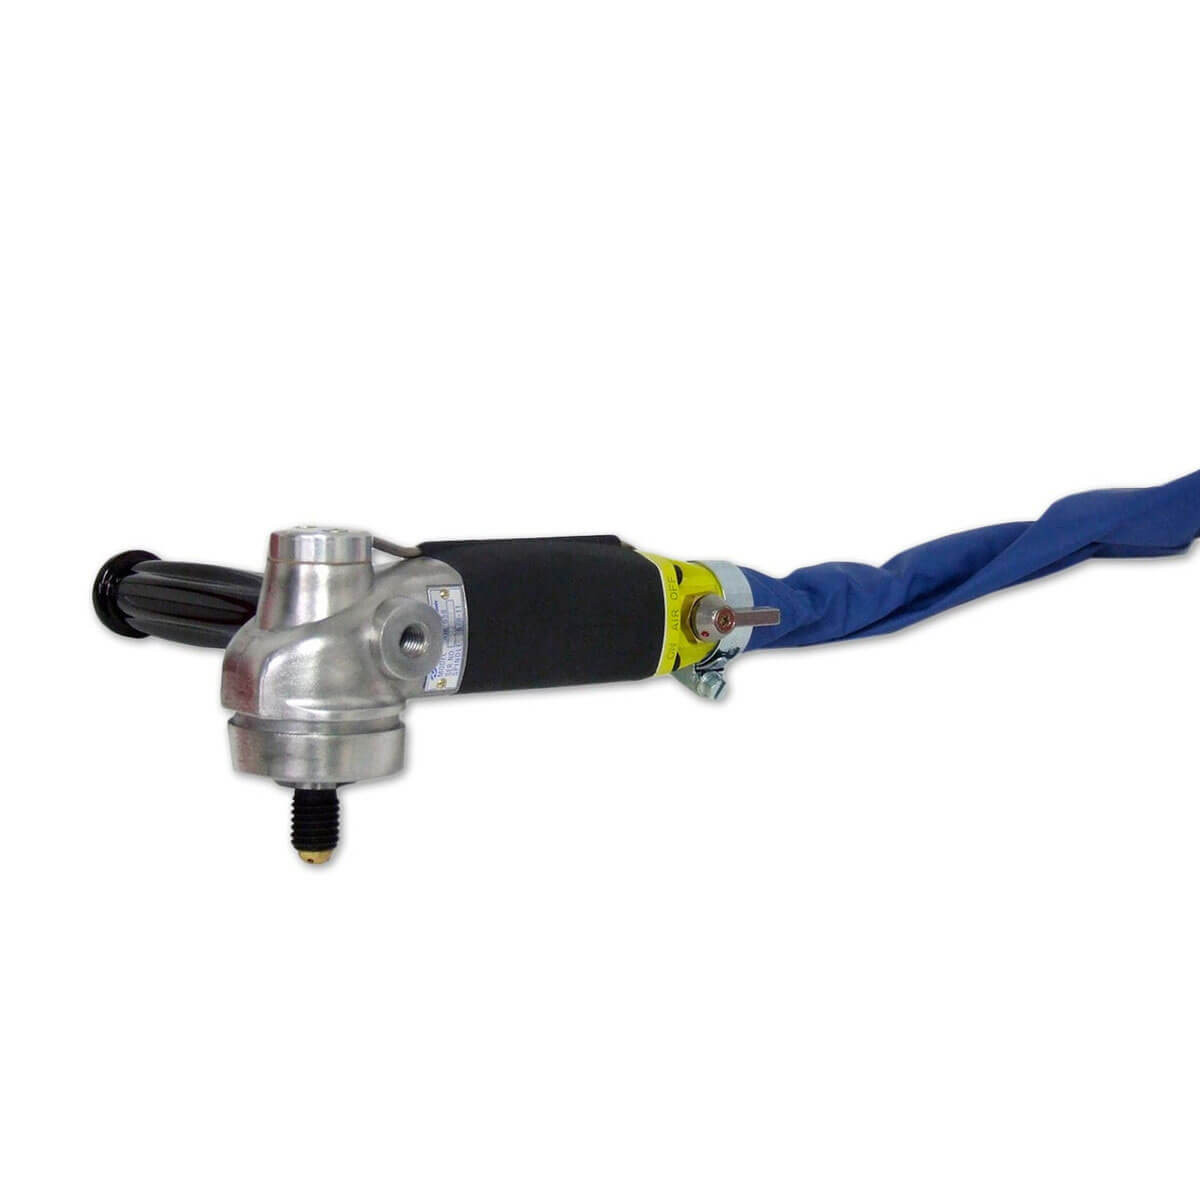 Alpha Tools AIR-680 Pneumatic Wet Polisher